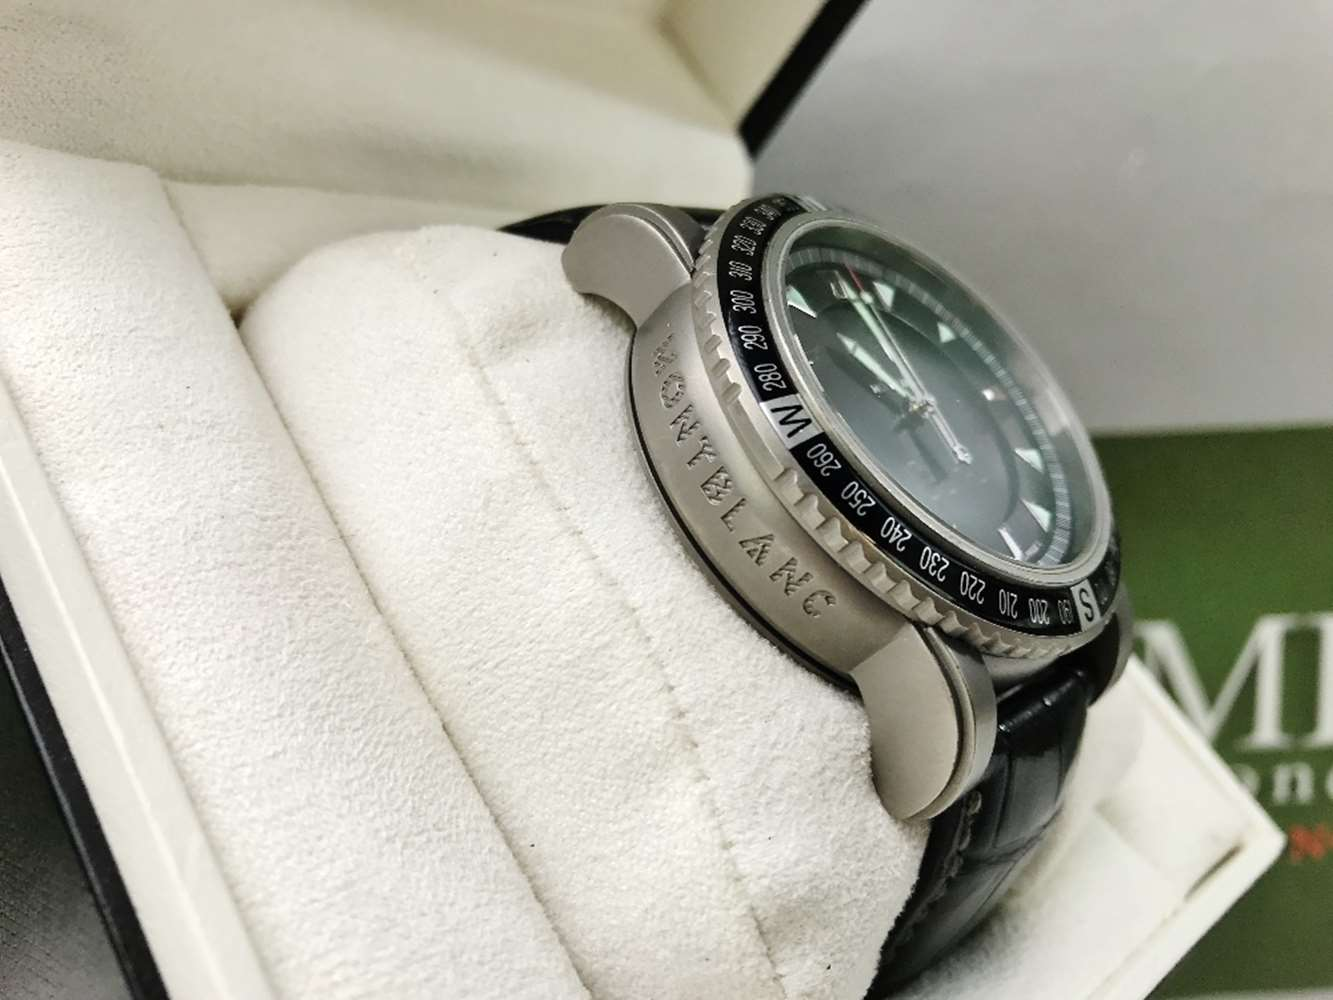 Lot 304 - Montblanc 7062 Titanium Multifunction Watch 44mm Bezel